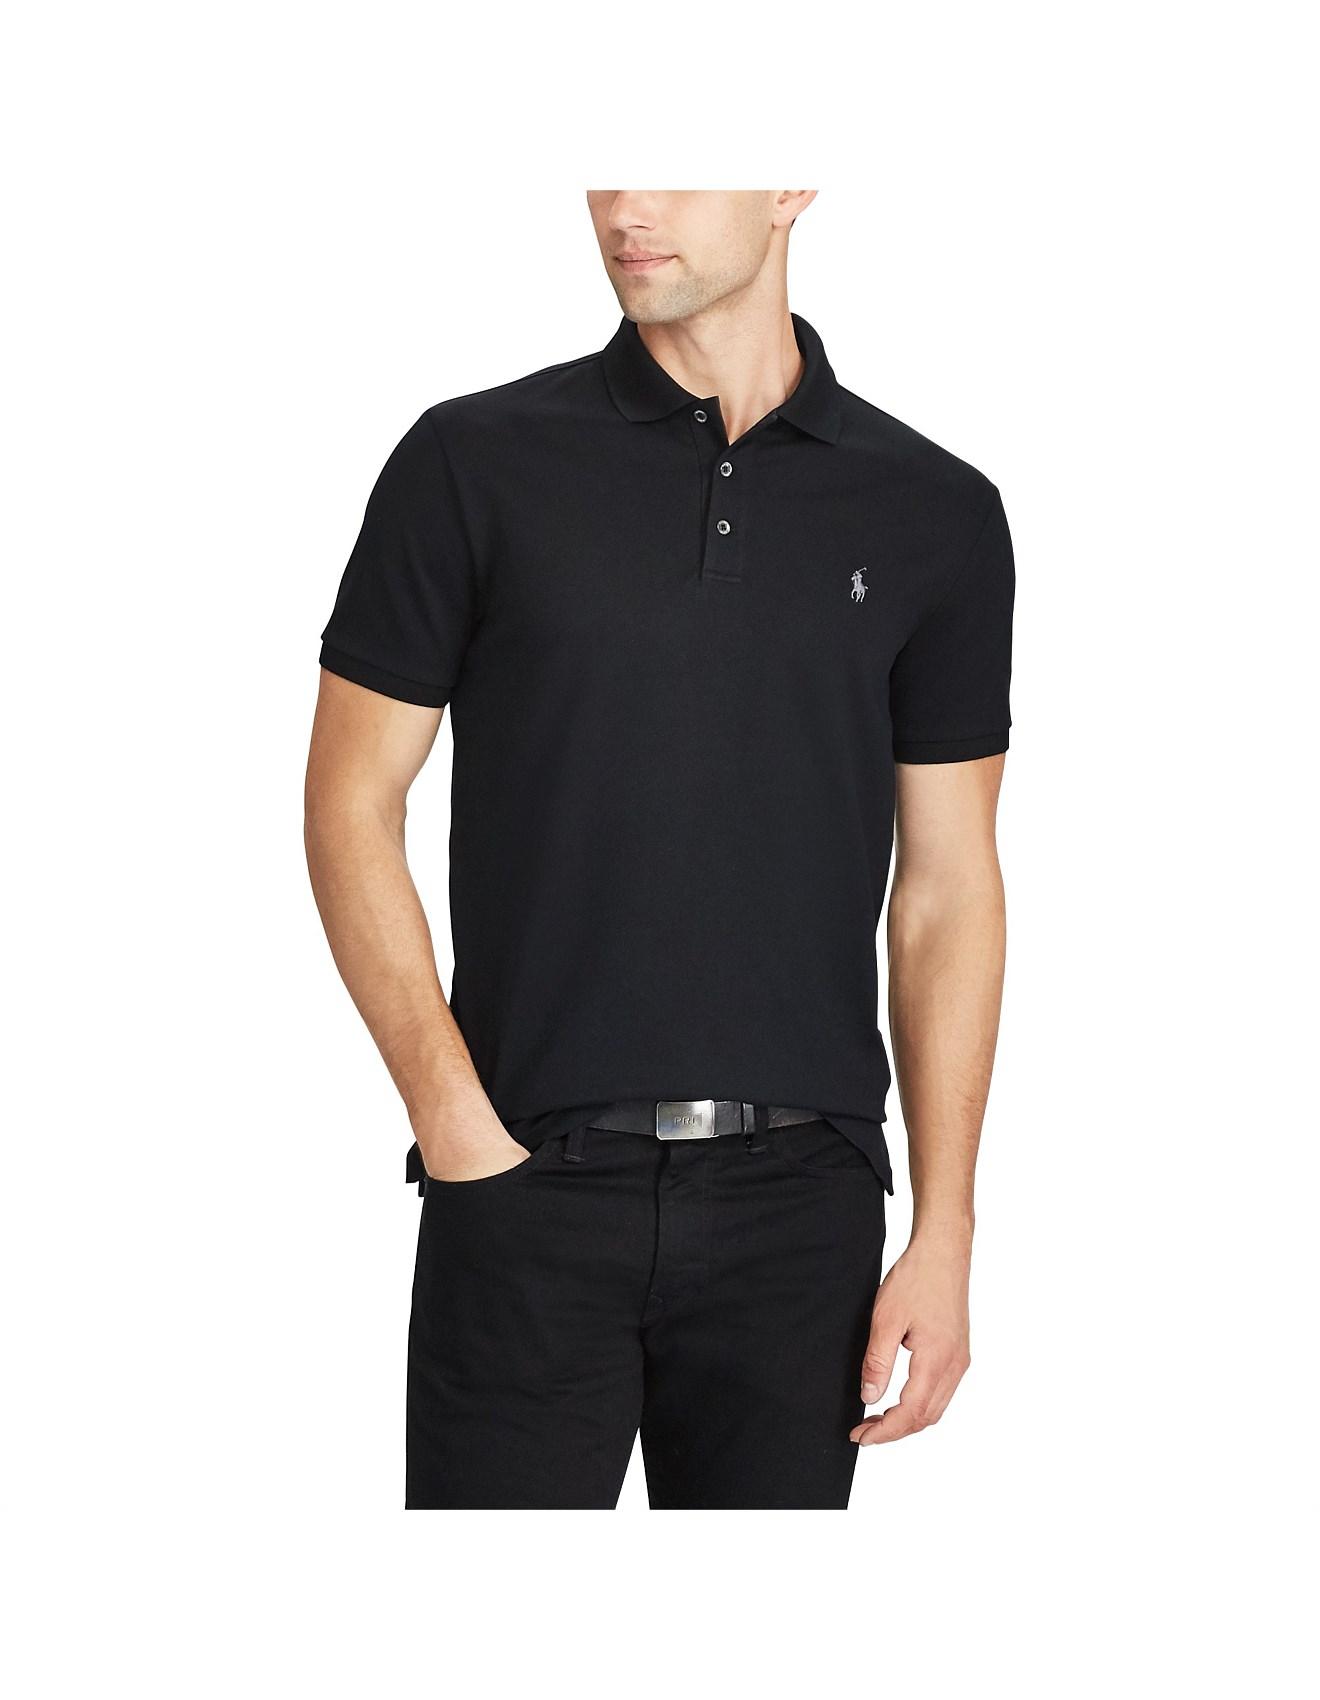 5ec1ed866c2 Men - Mens Custom Slim Fit Stretch Polo